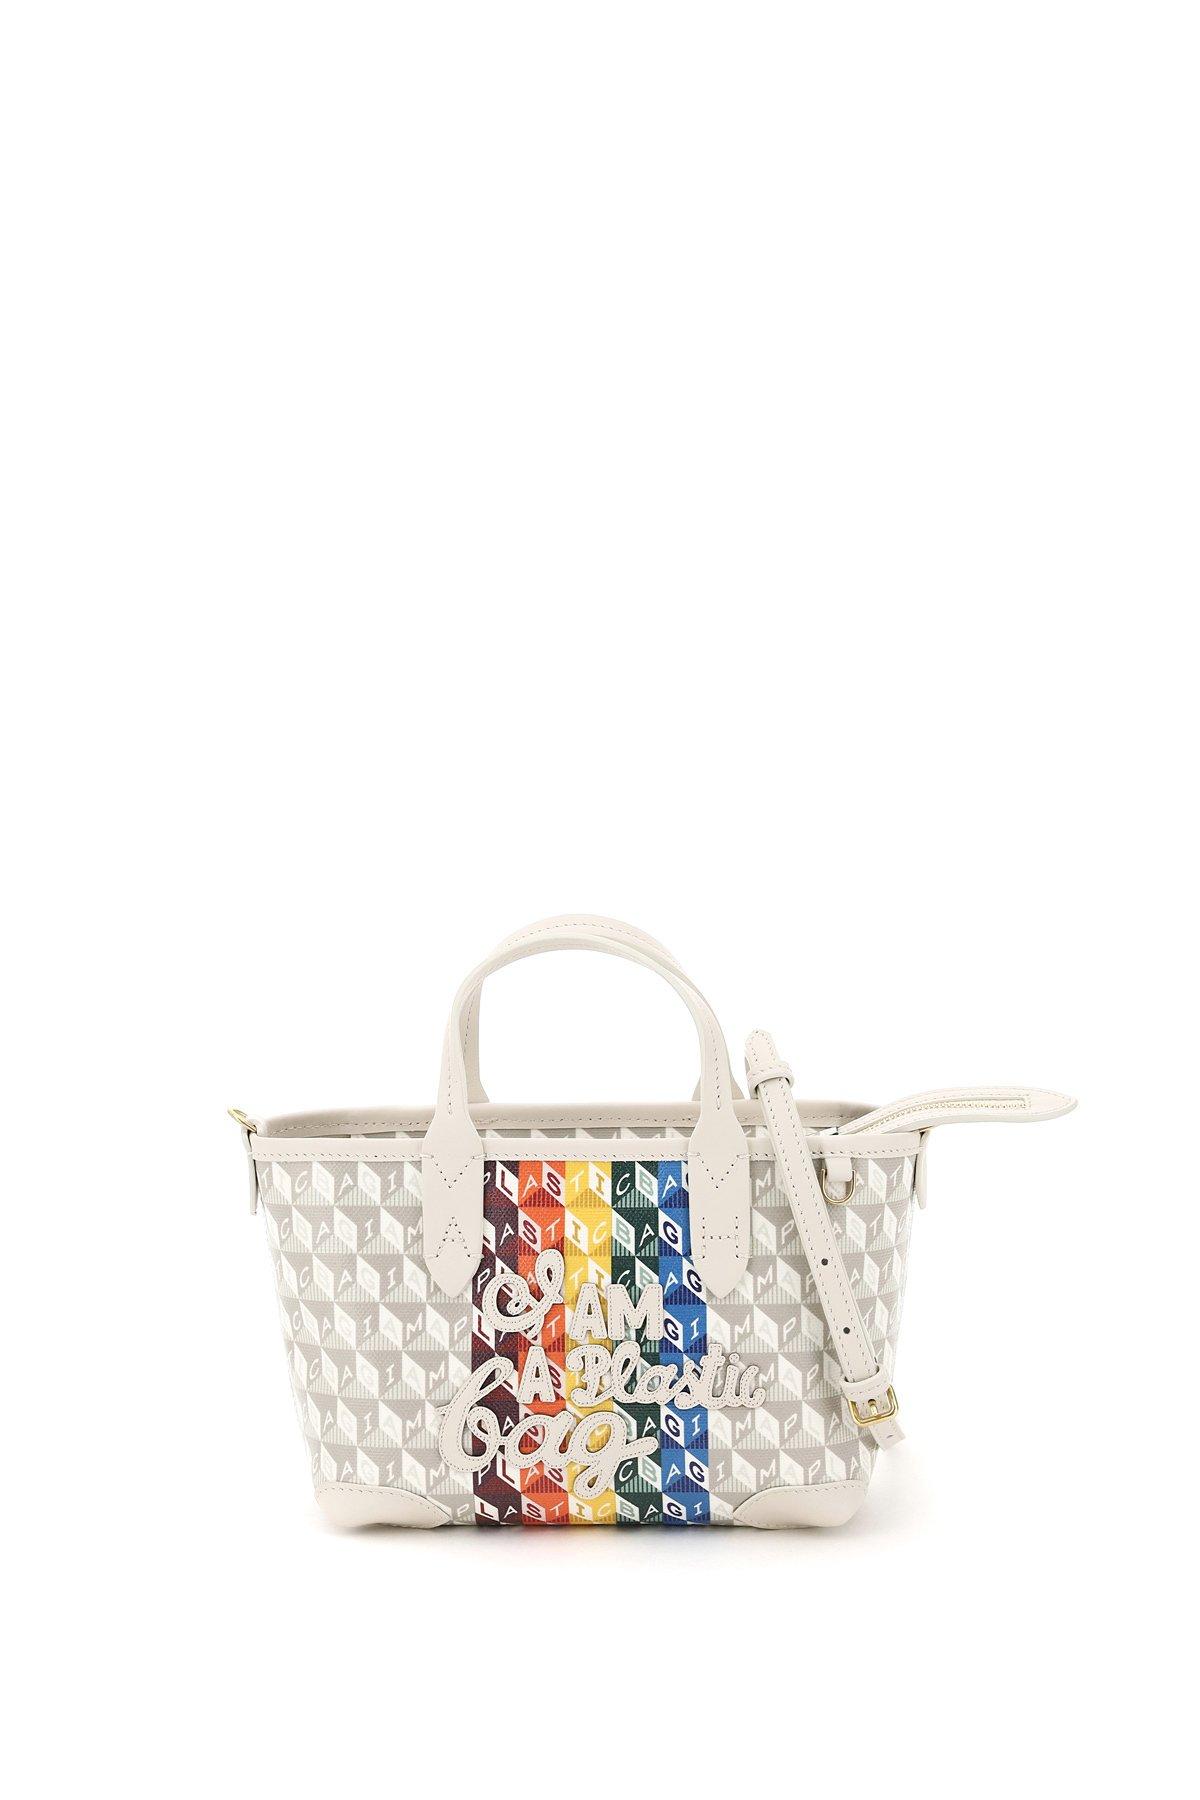 Anya hindmarch mini shopping i am a plastic bag